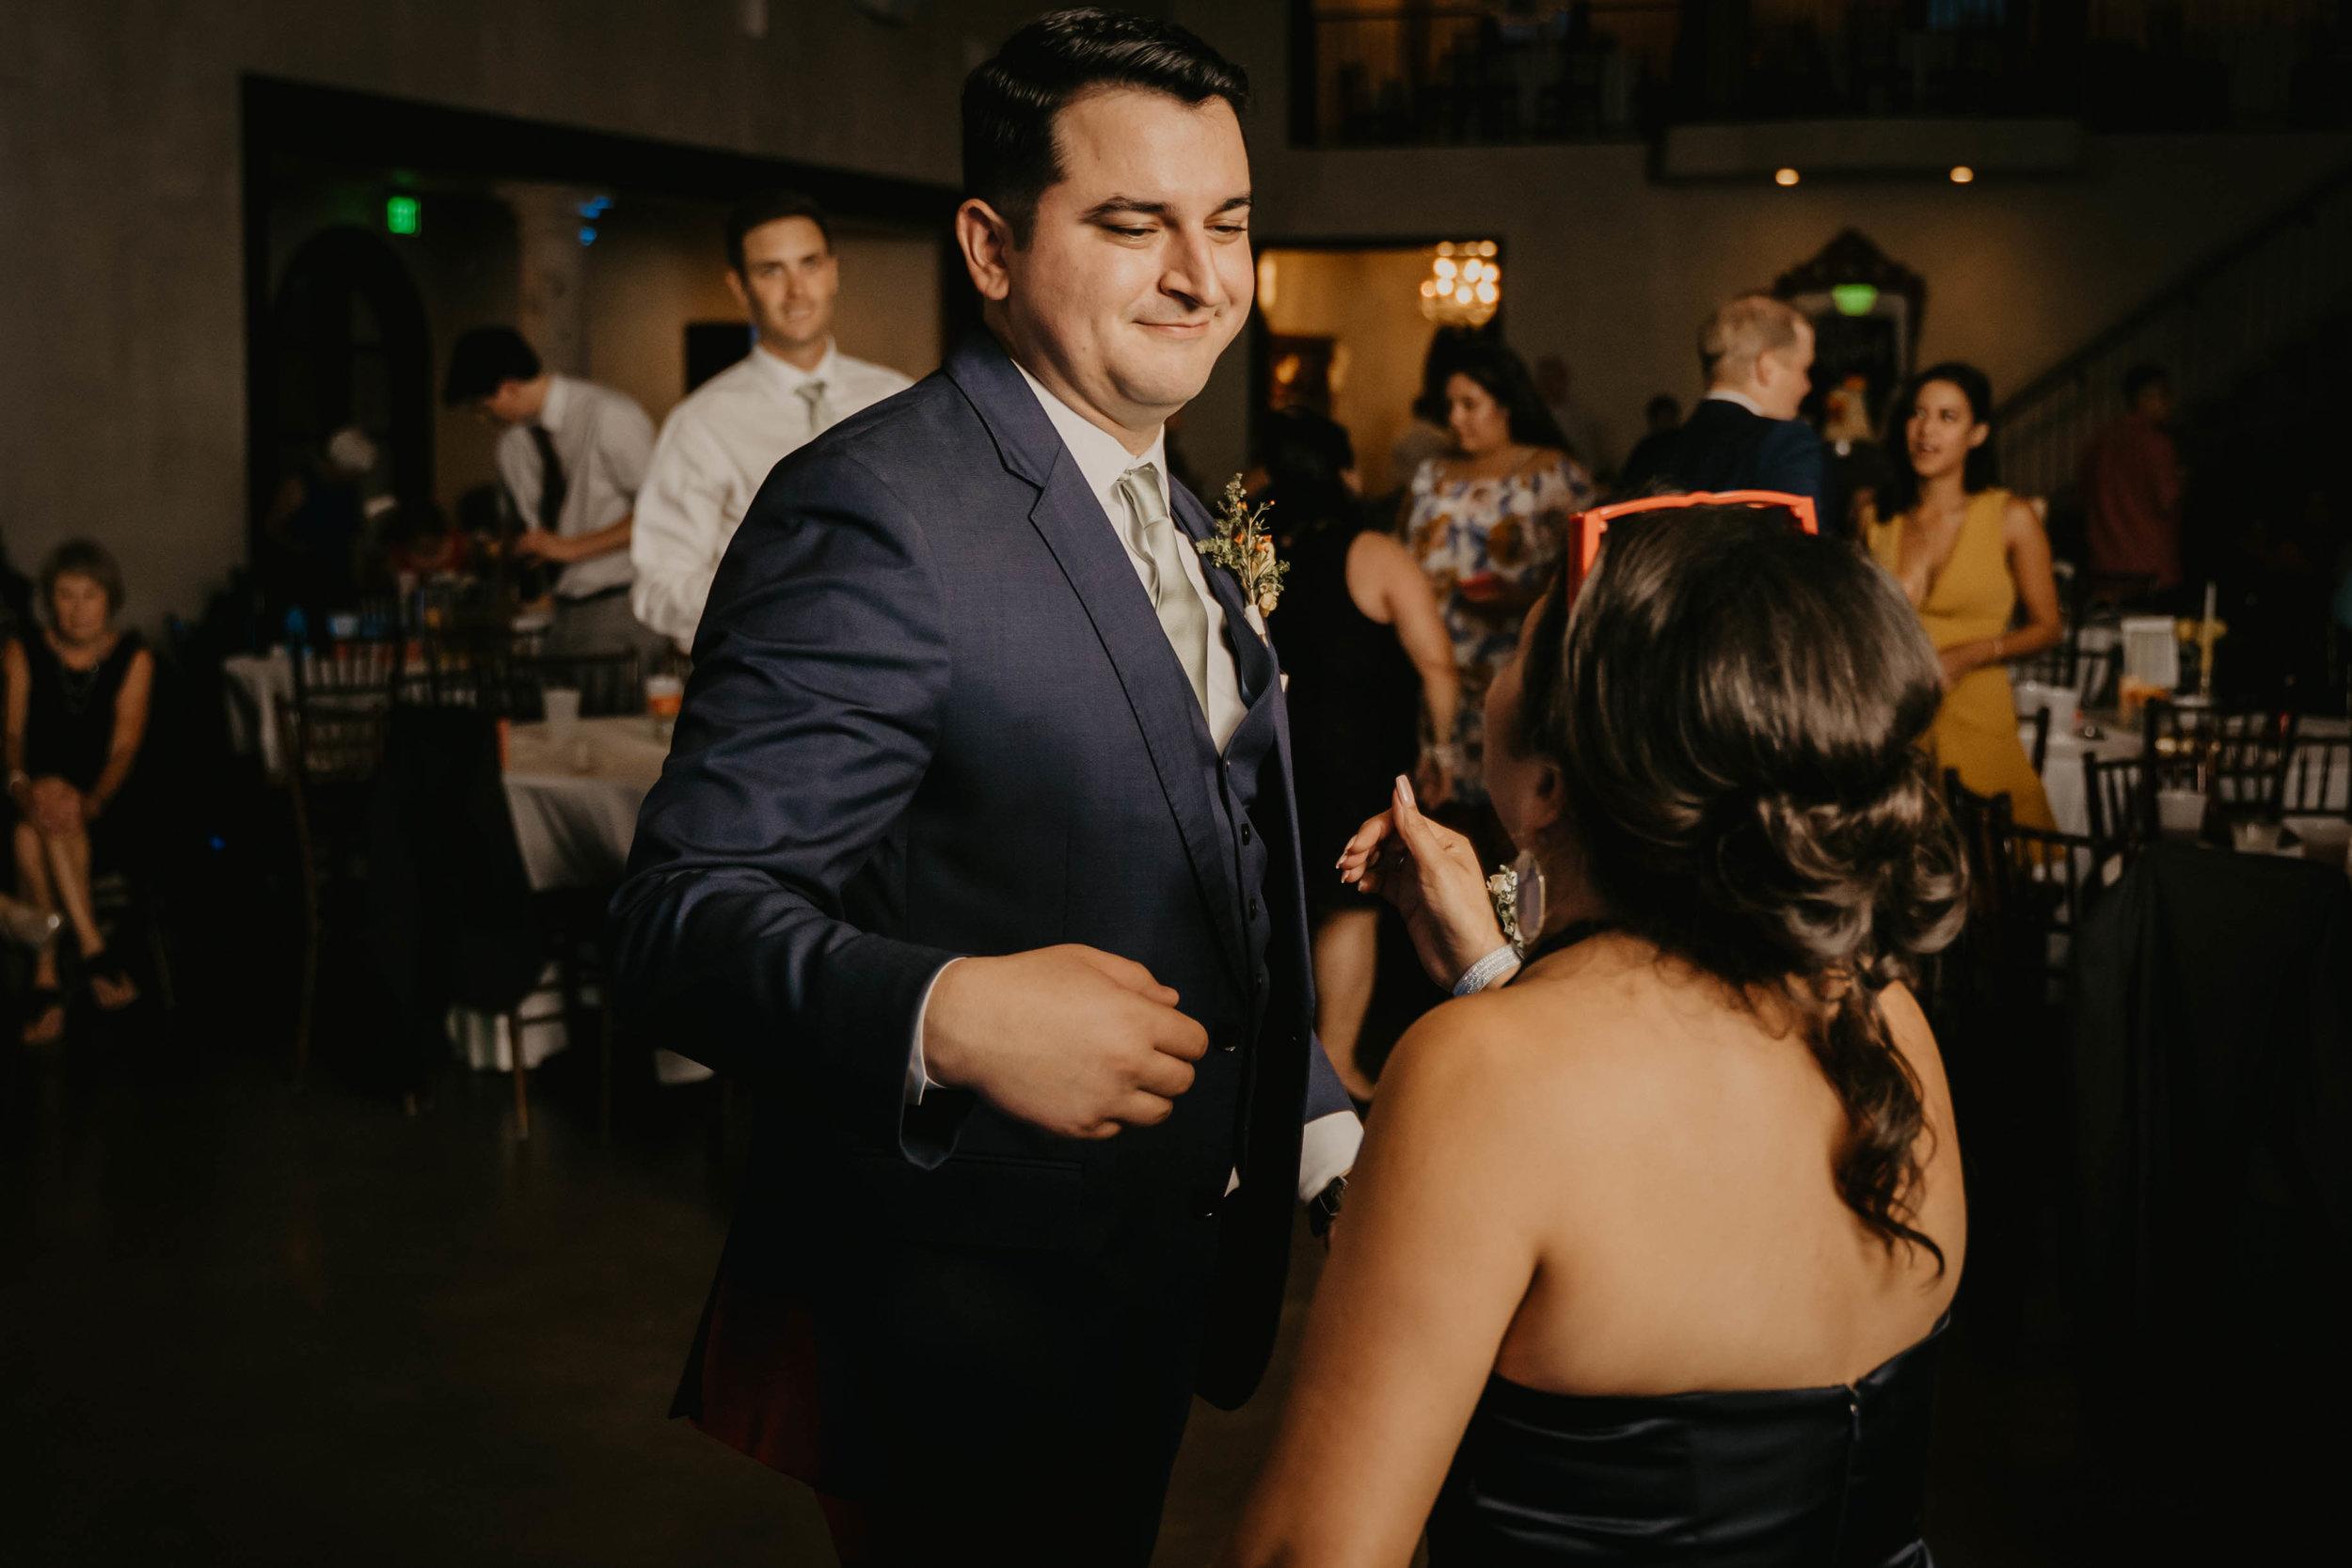 austin-wedding-videographer (52 of 999).jpg